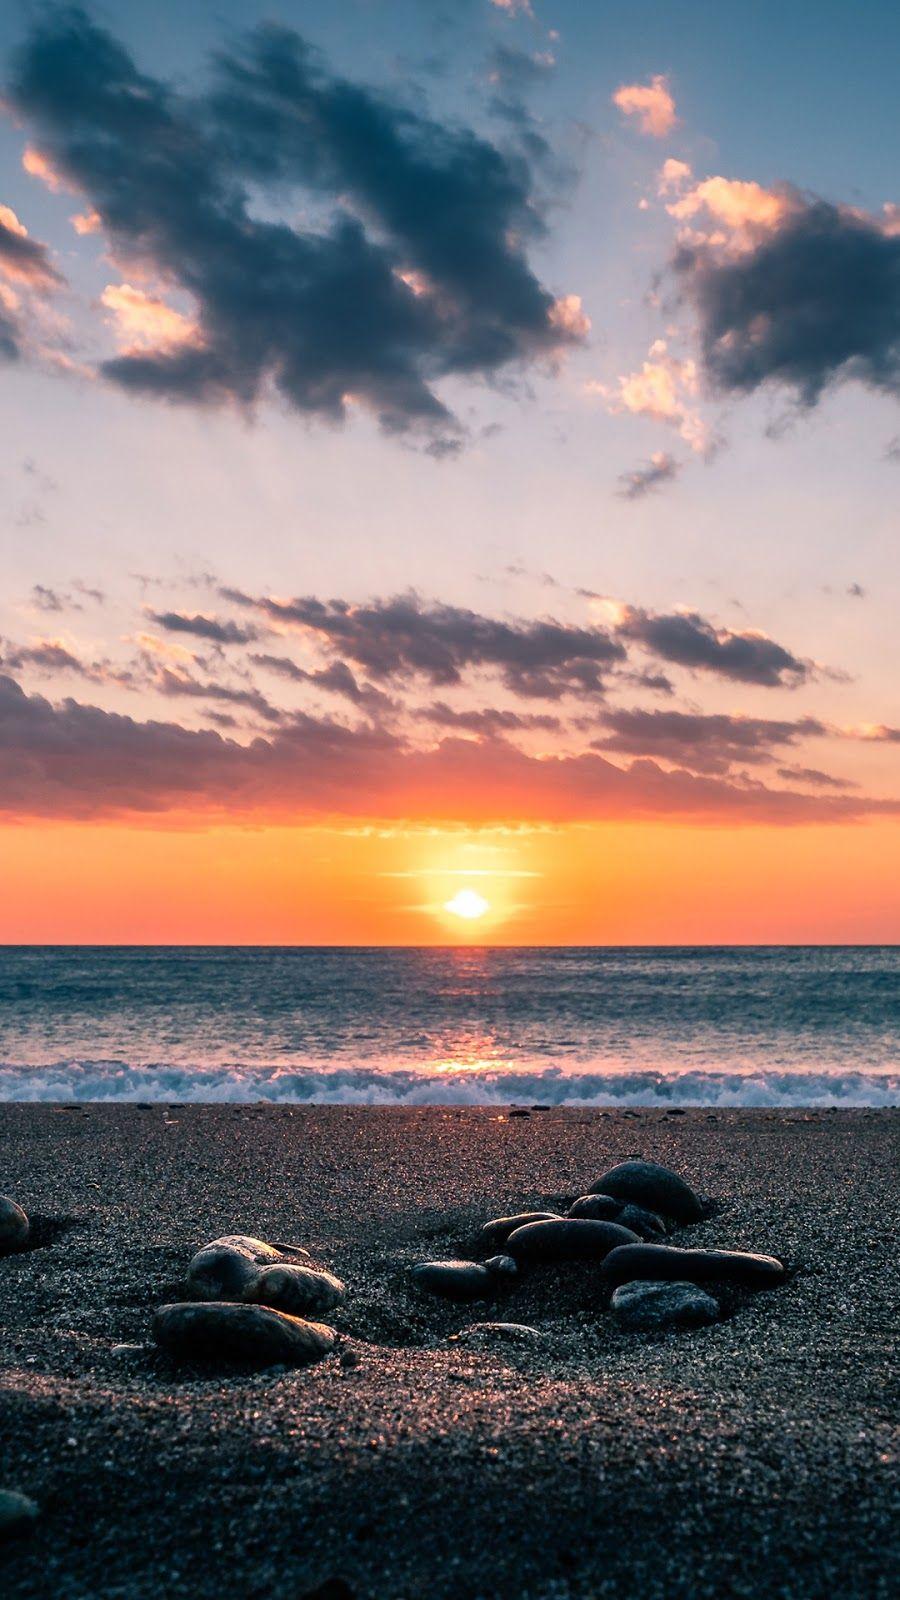 Calm Day Scenic Wallpaper Beach Sunset Wallpaper